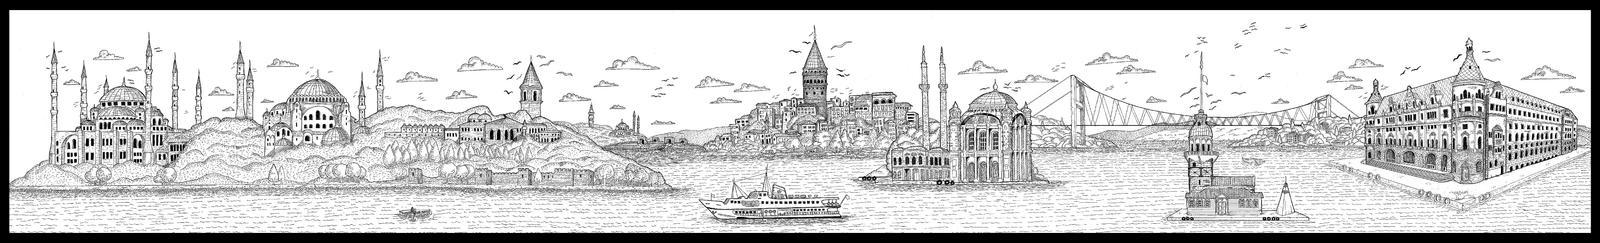 Istanbul by Serdarakman